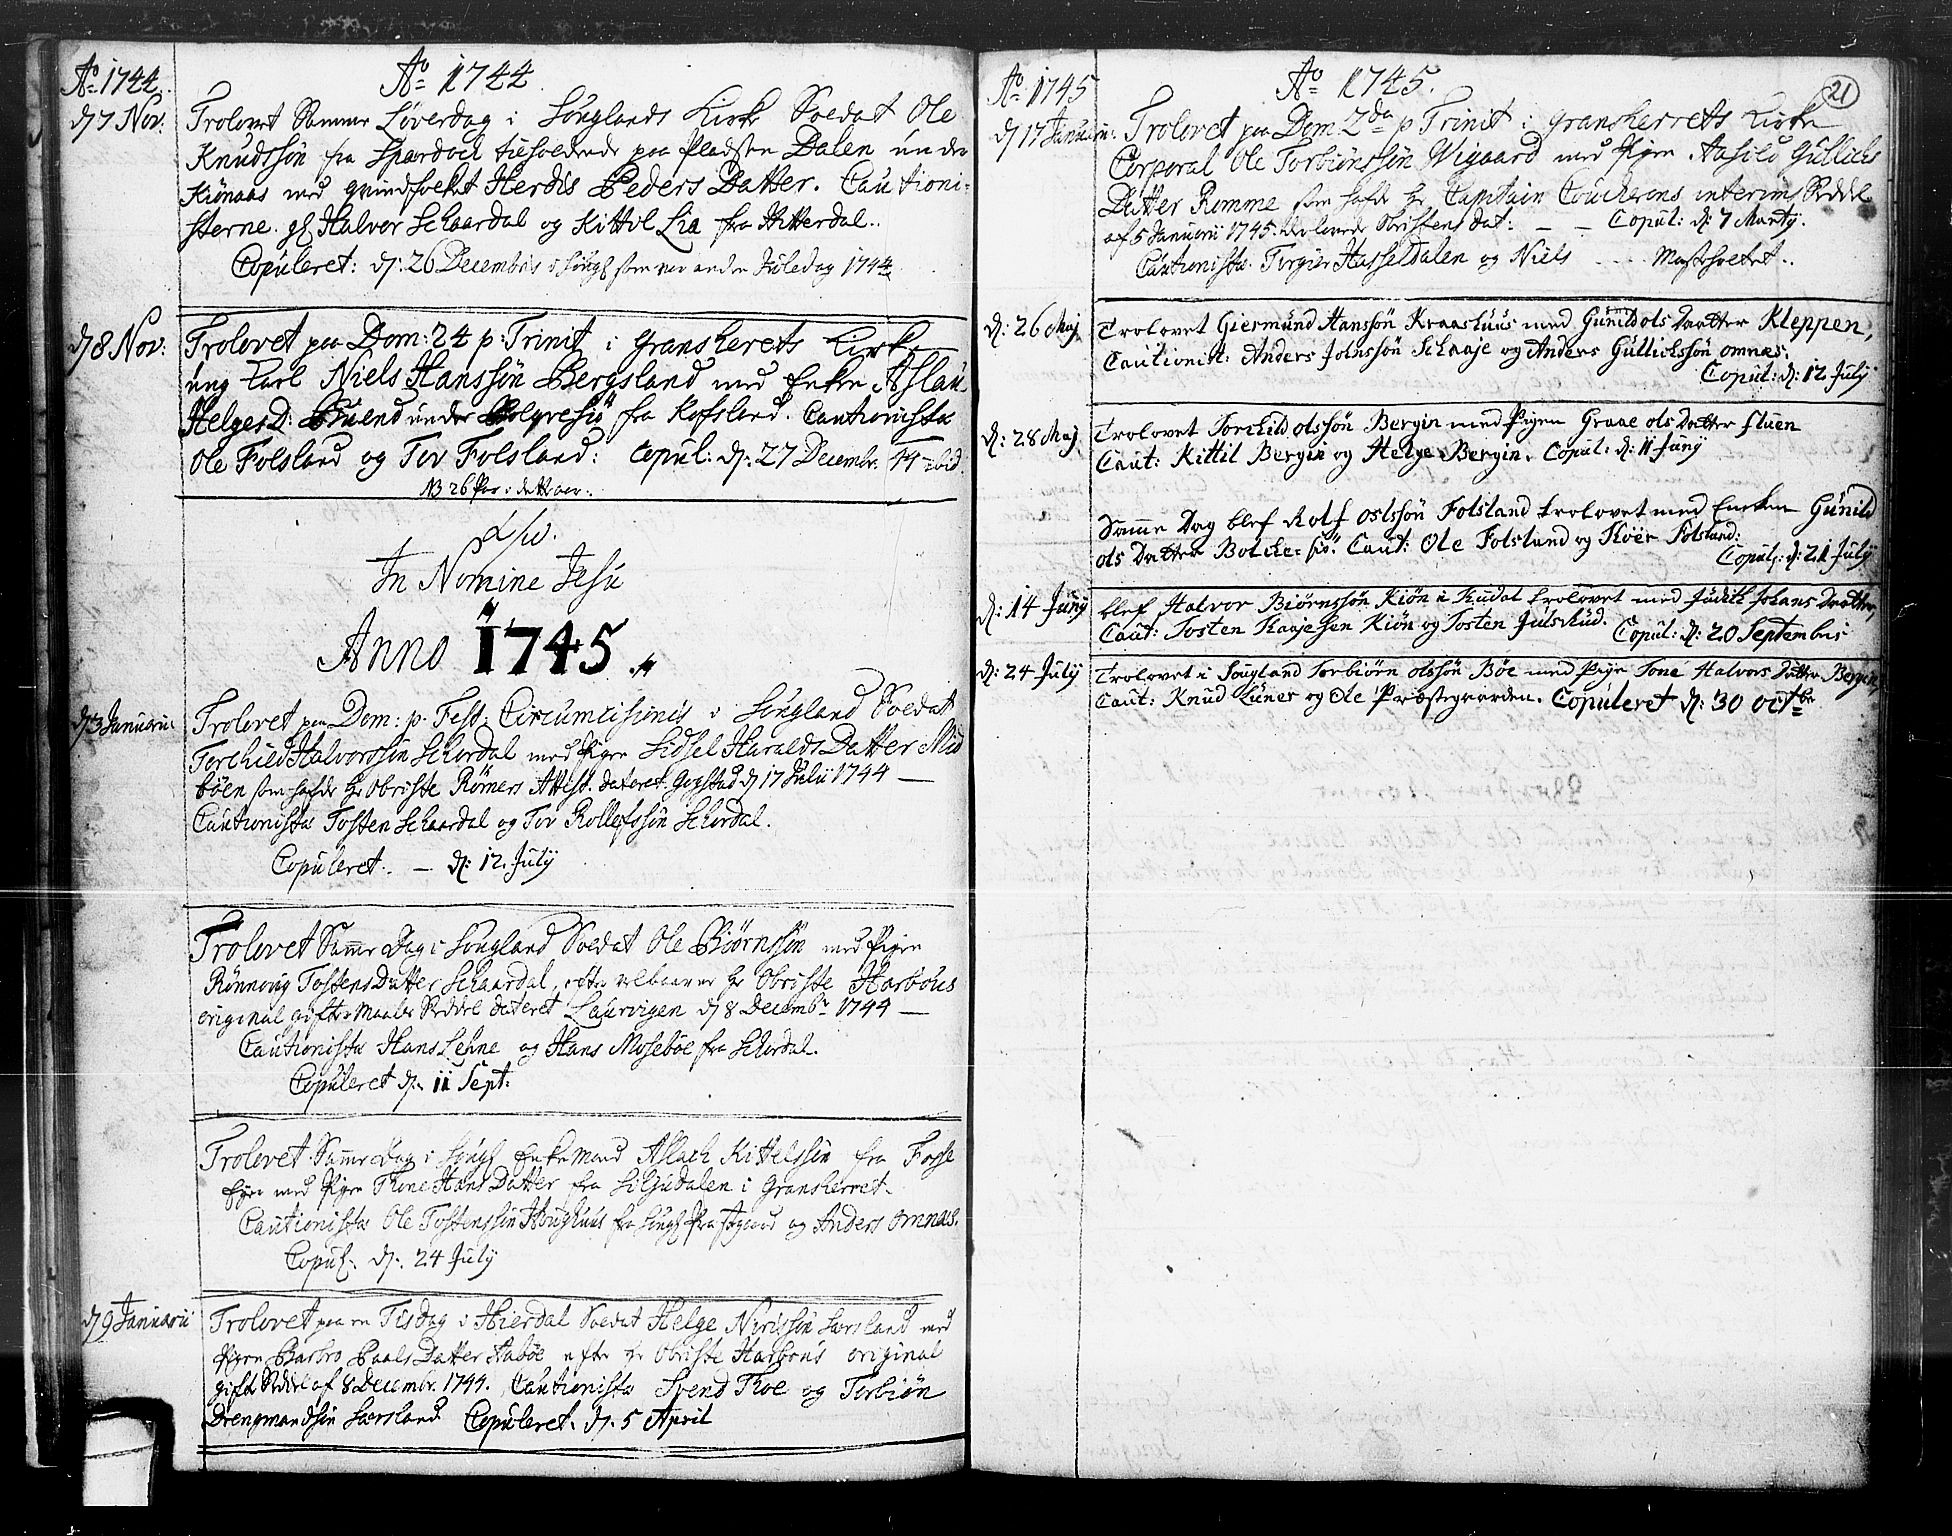 SAKO, Hjartdal kirkebøker, F/Fa/L0004: Ministerialbok nr. I 4, 1727-1795, s. 21